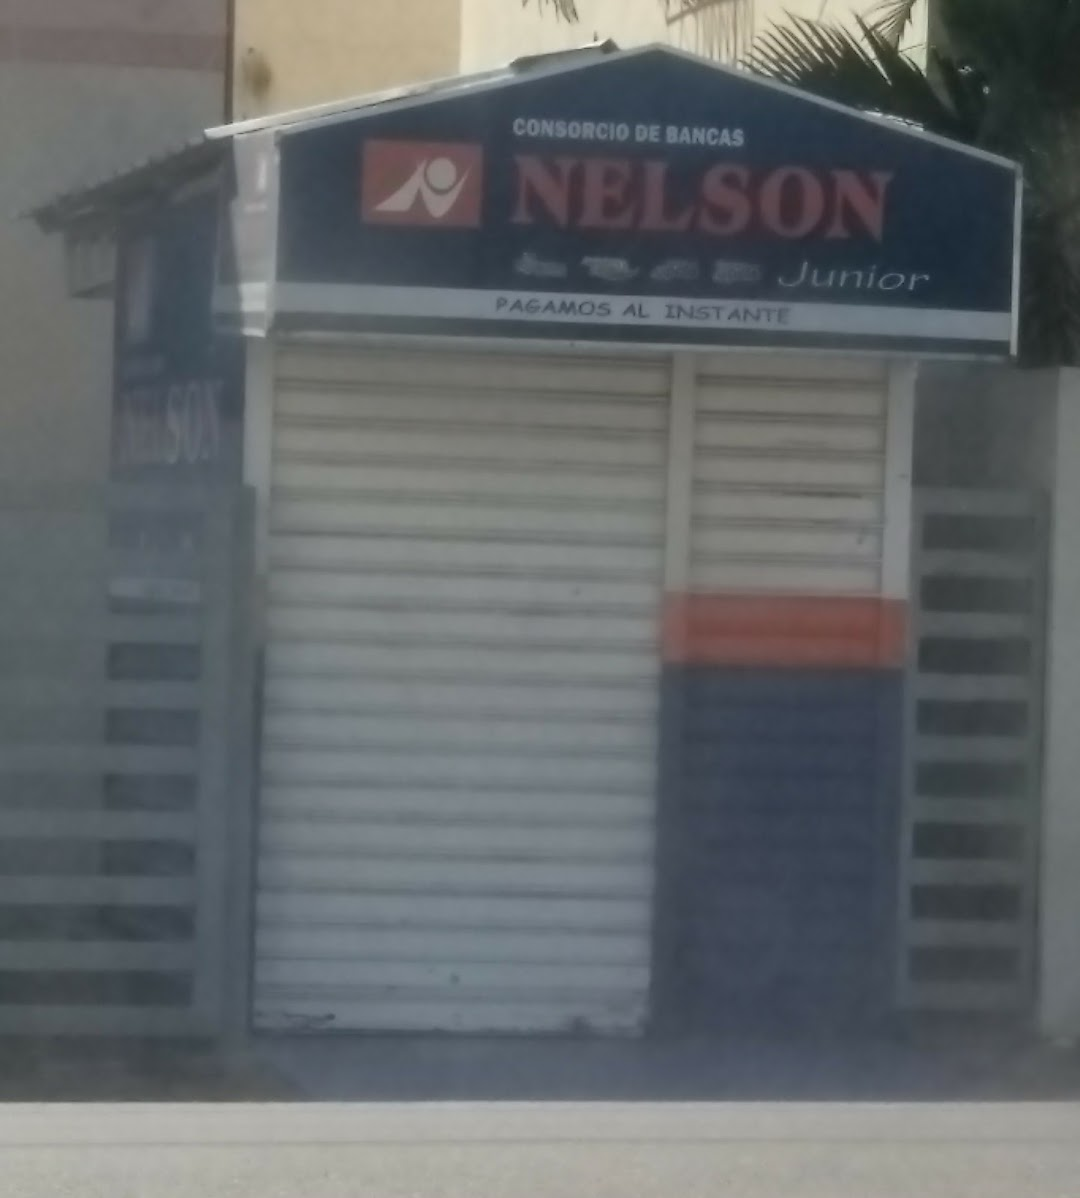 Banca Nelson